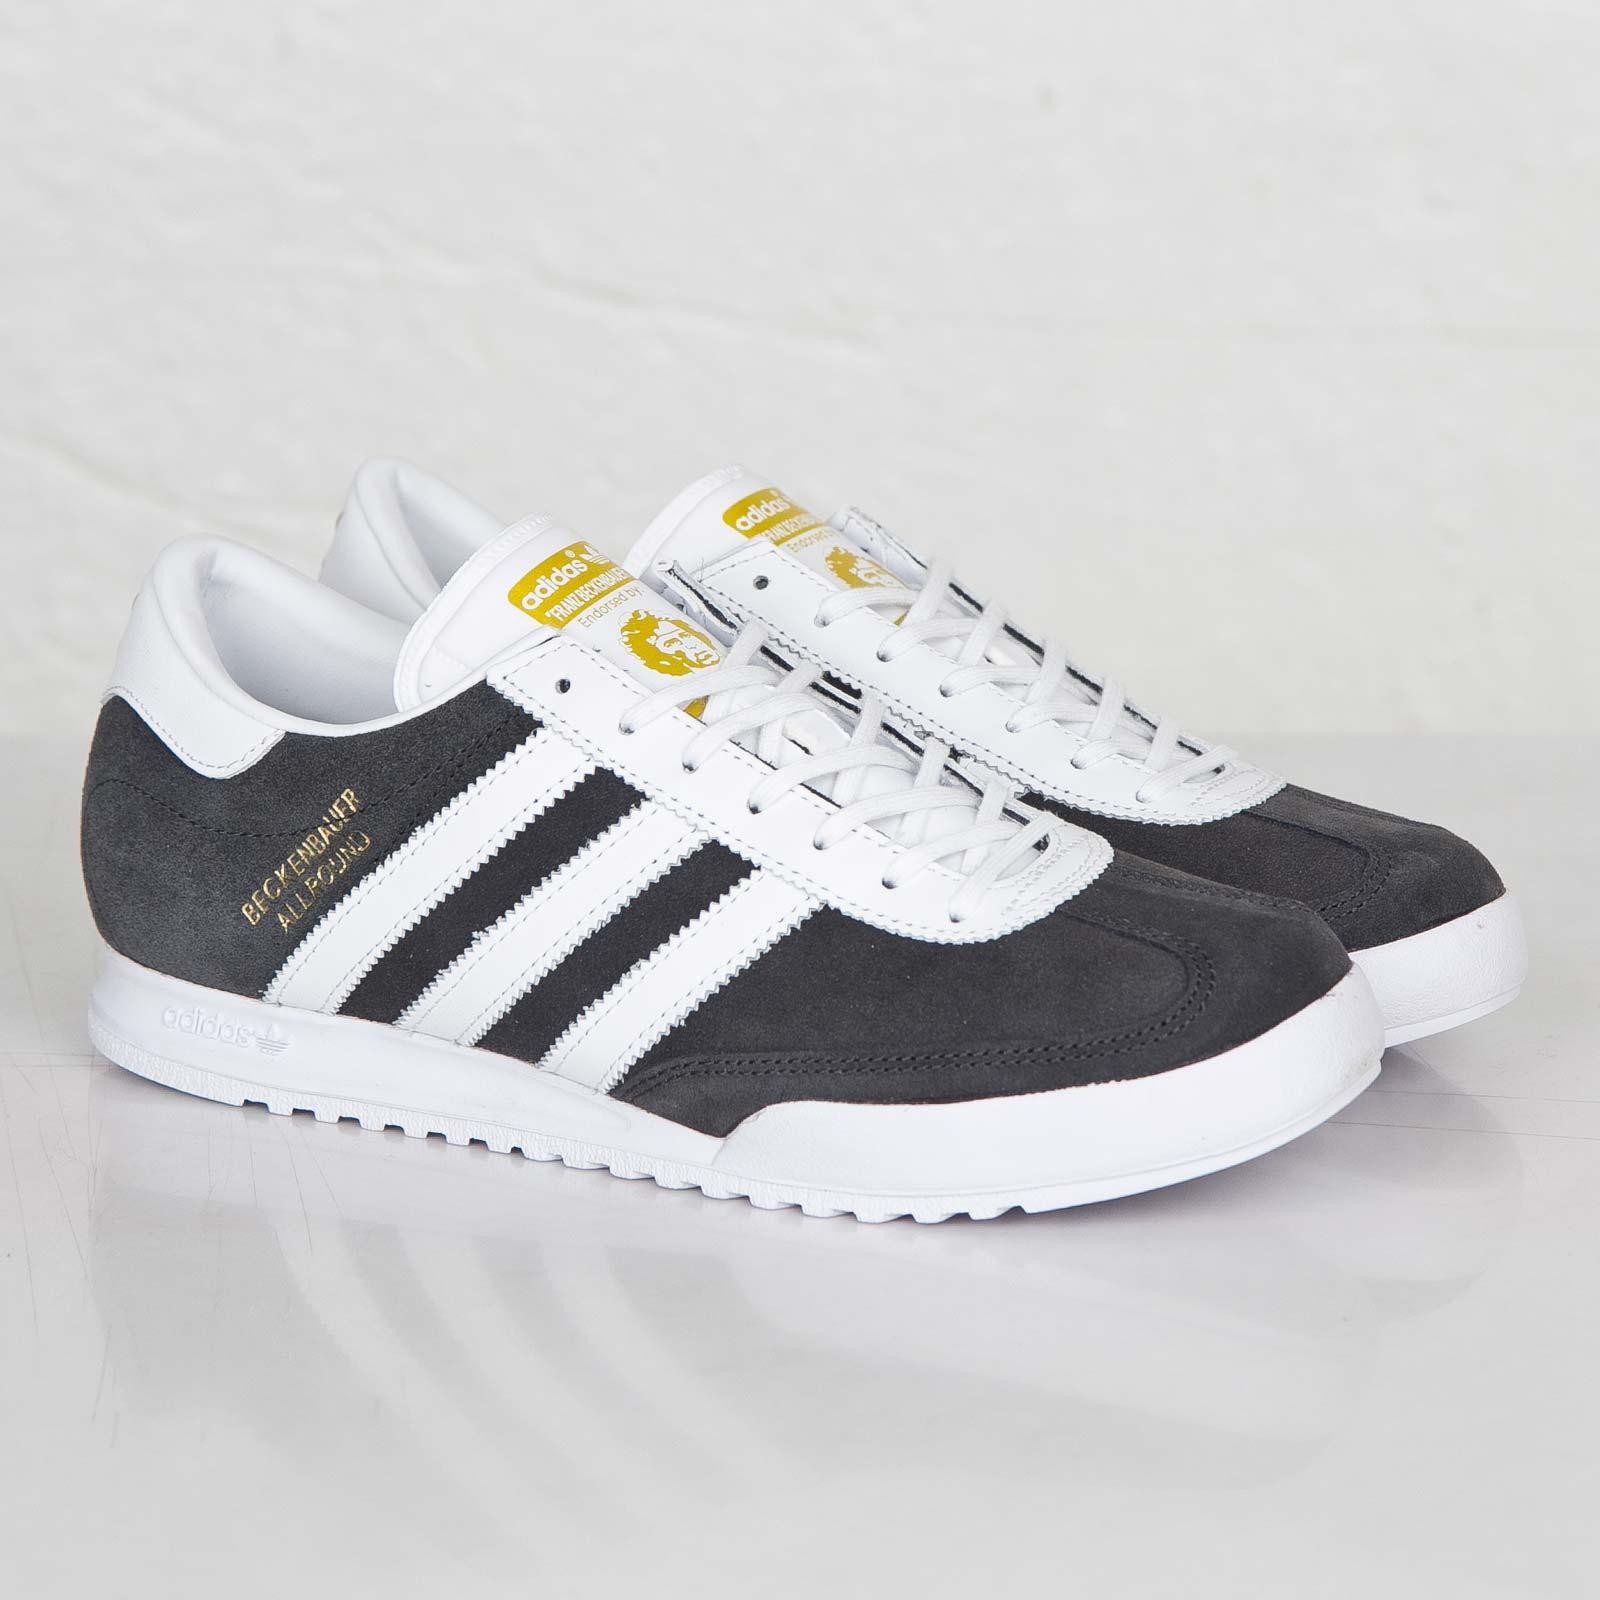 adidas Beckenbauer B34801 Sneakersnstuff   sneakers